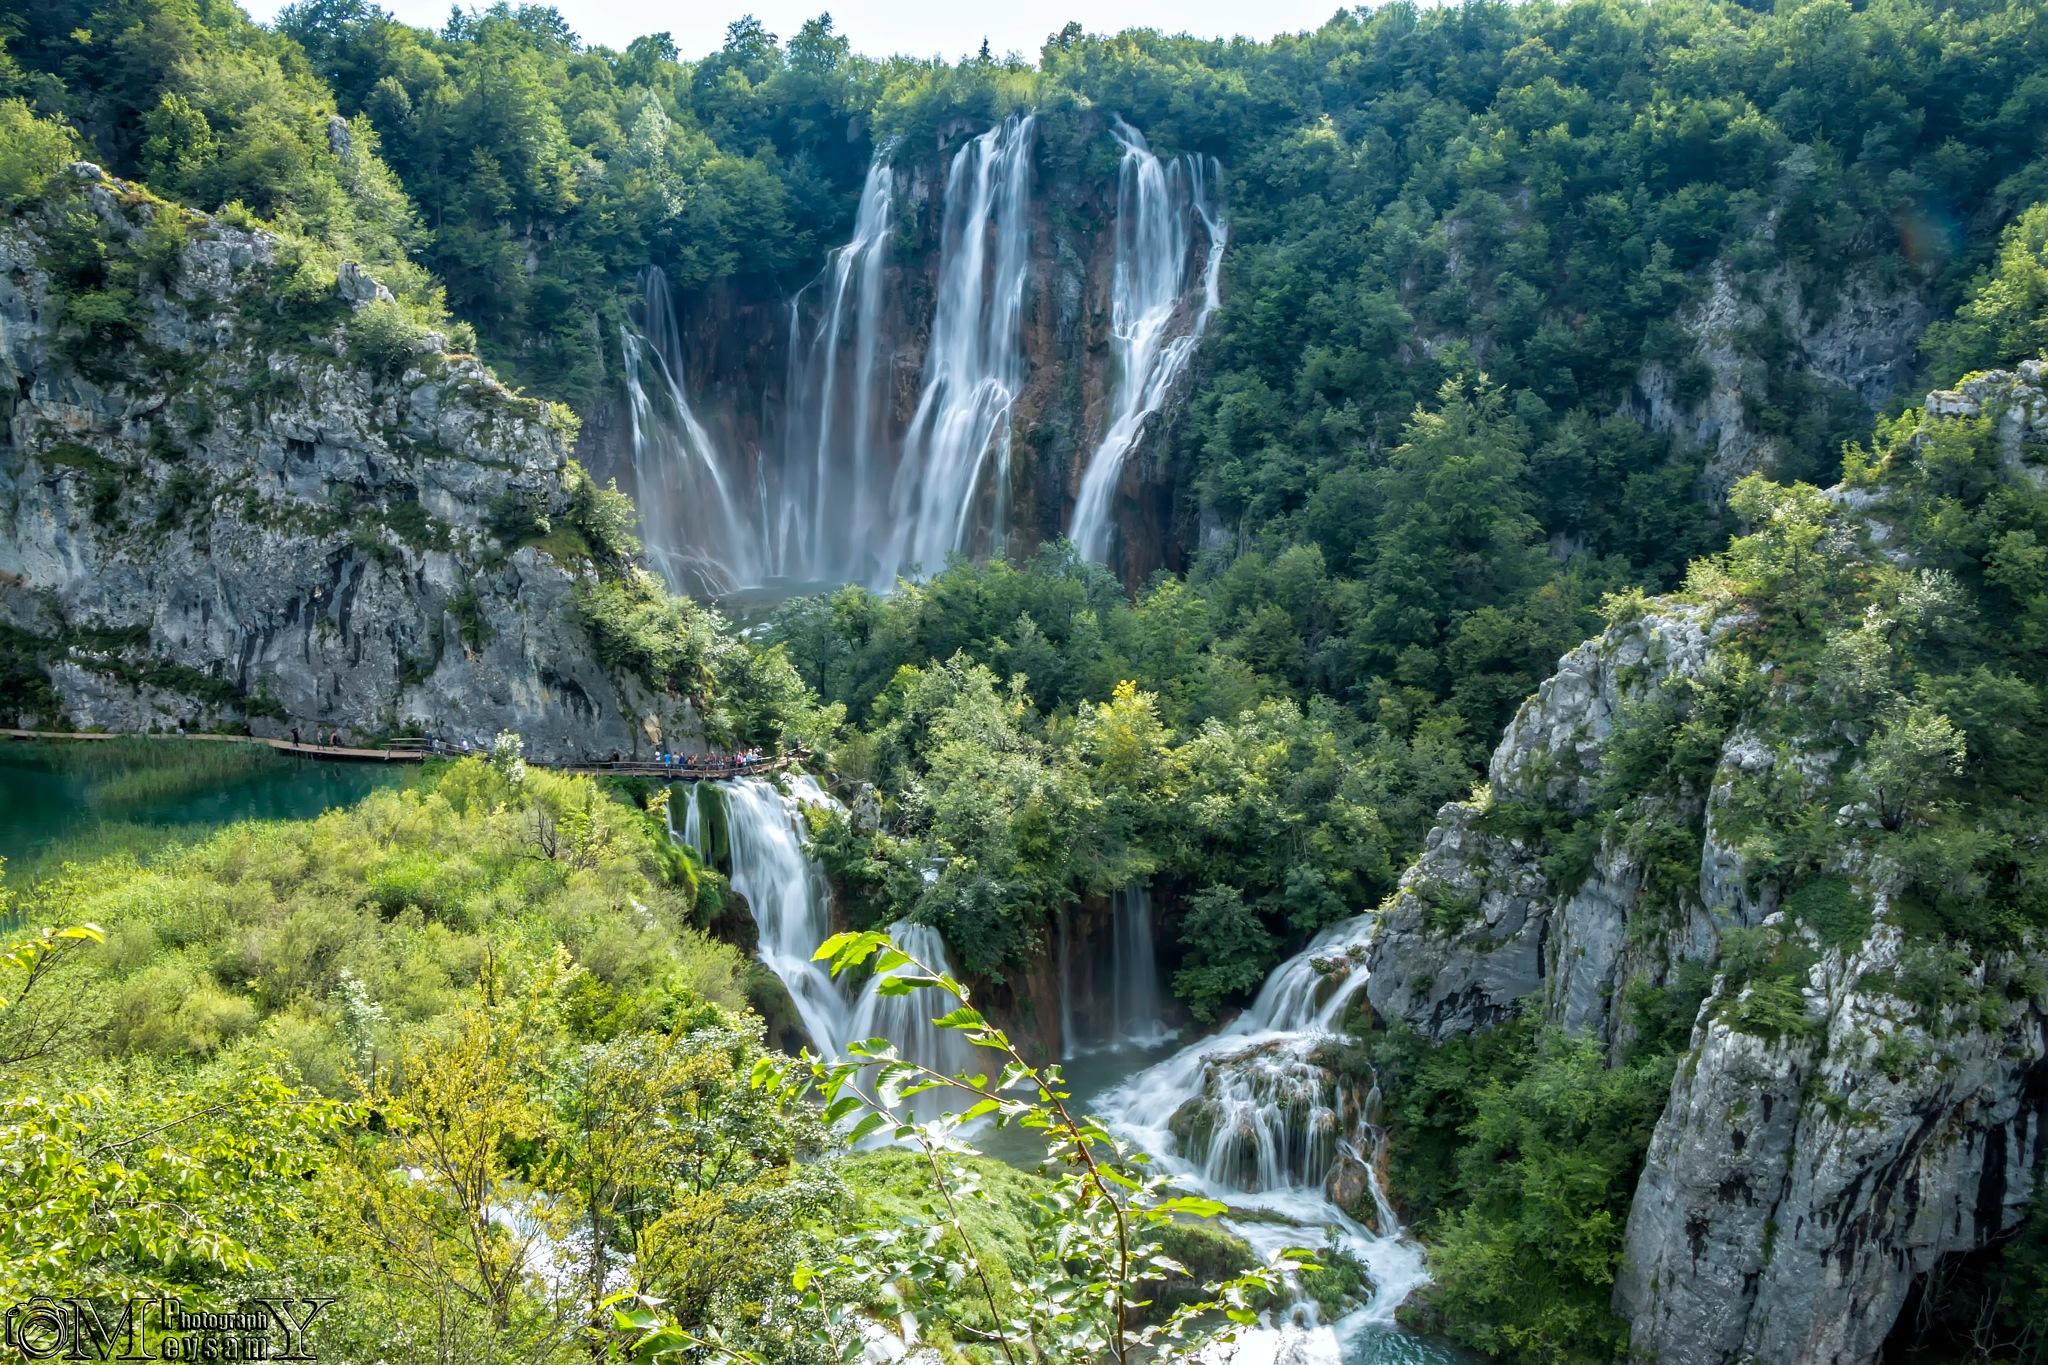 Plitvice lakes and waterfalls by Meysam Mashayekh